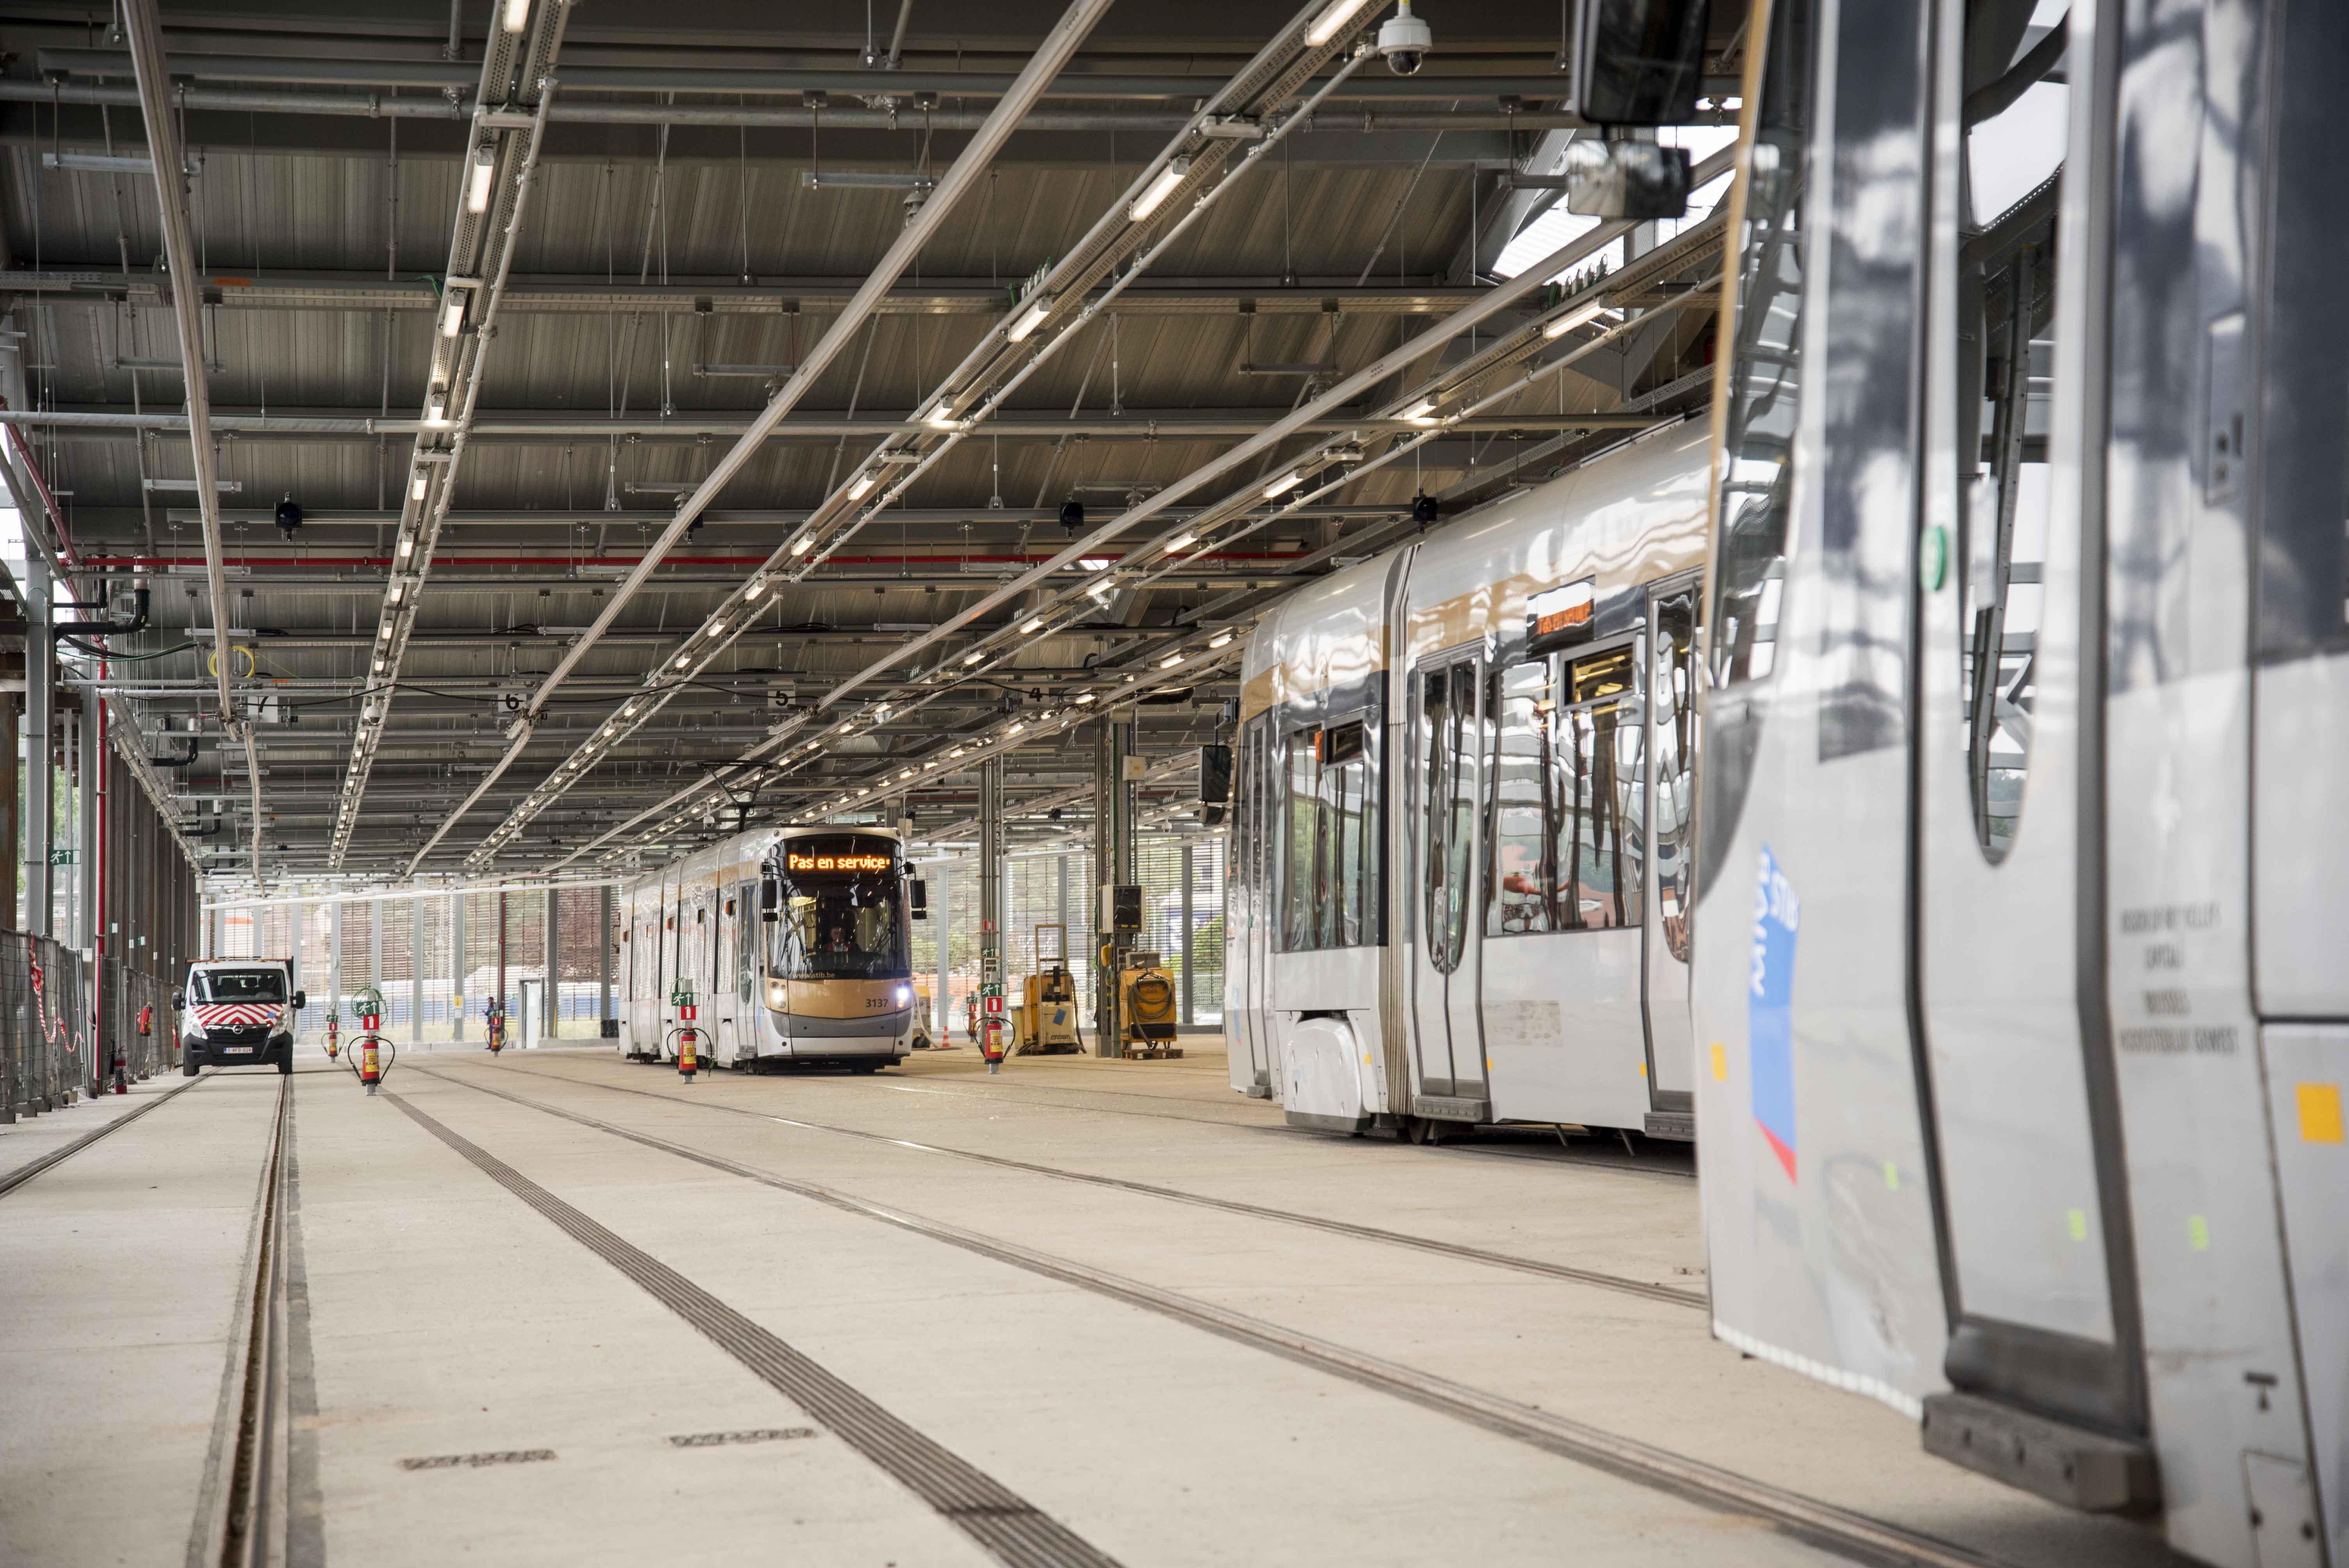 depot-marconi-remise-stib